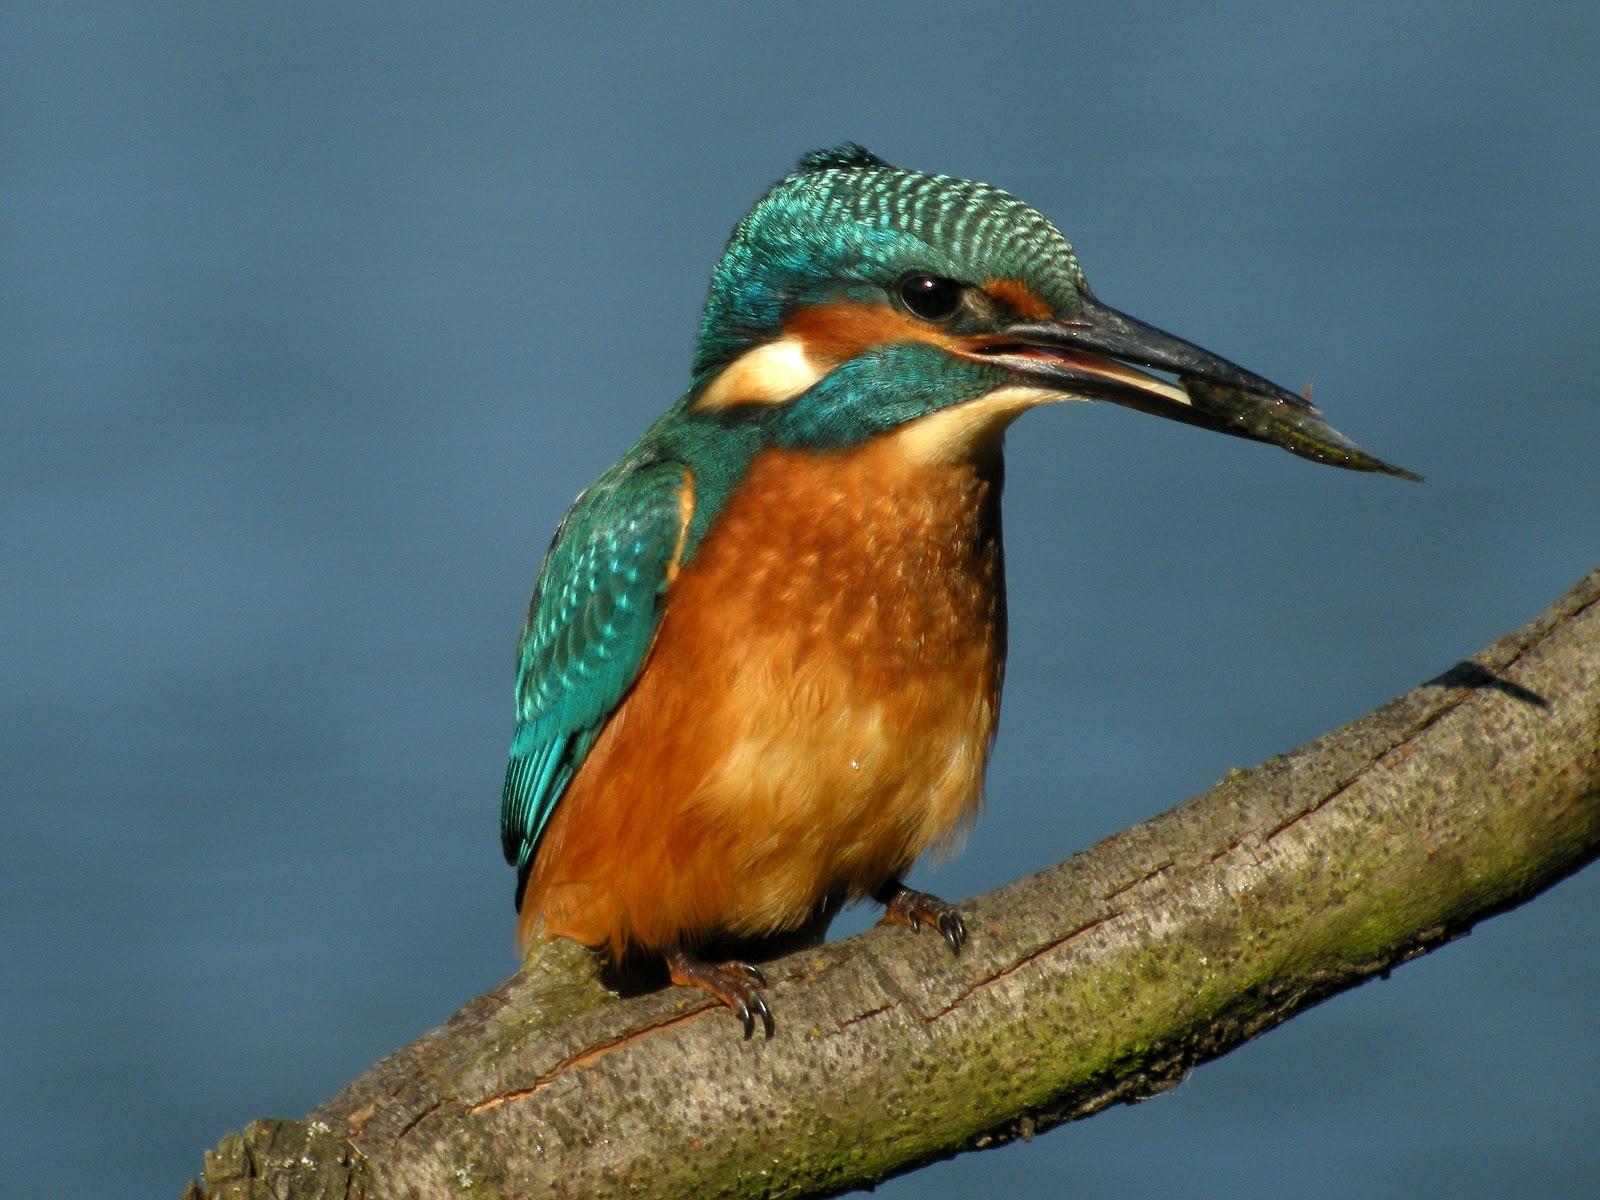 Col's Digiscope Blog: Kingfisher